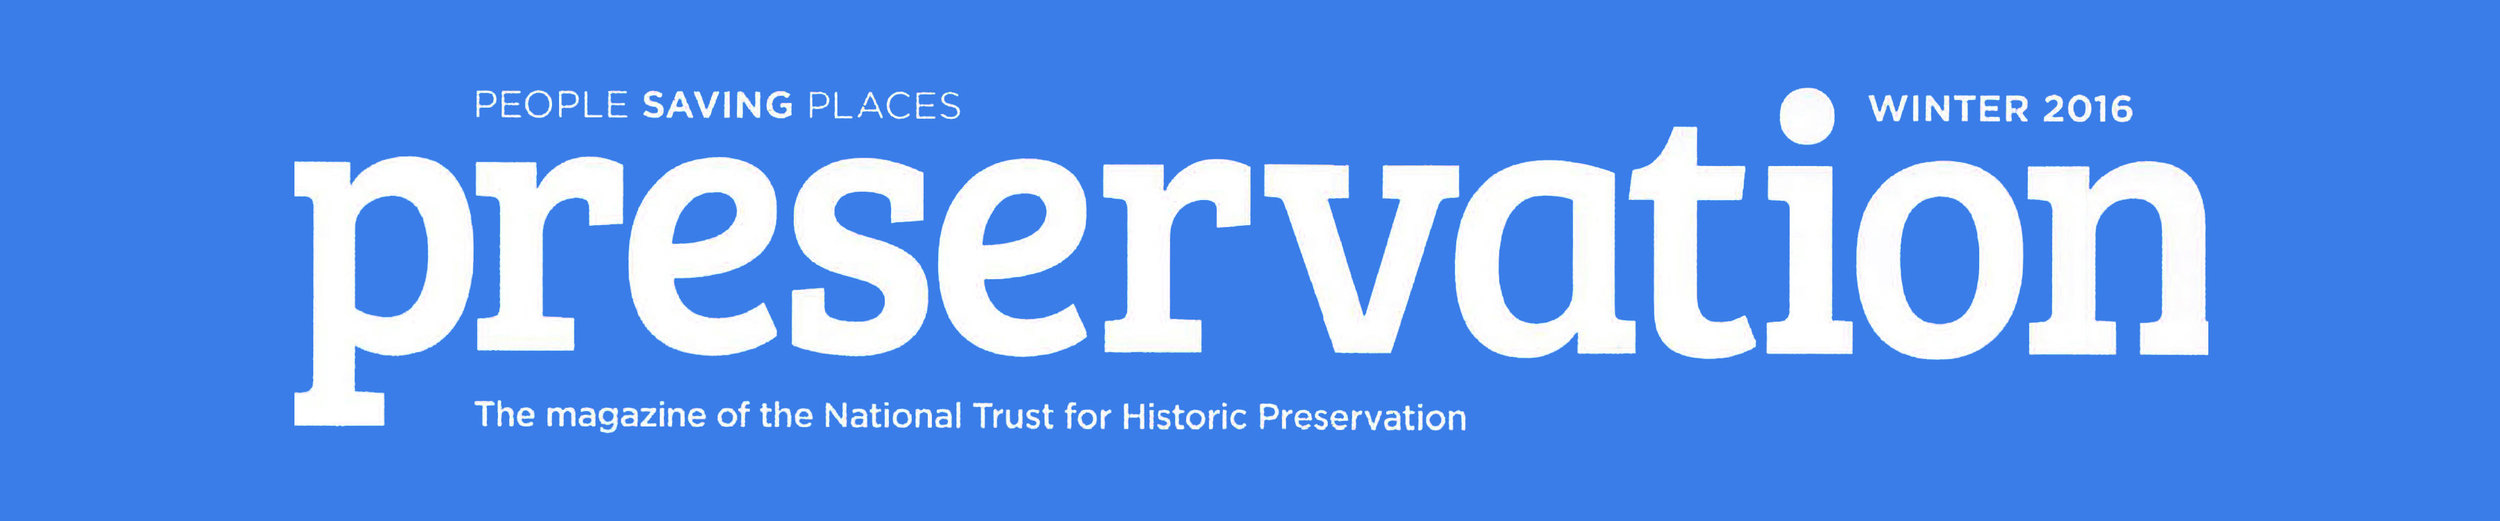 PreservationMagazine